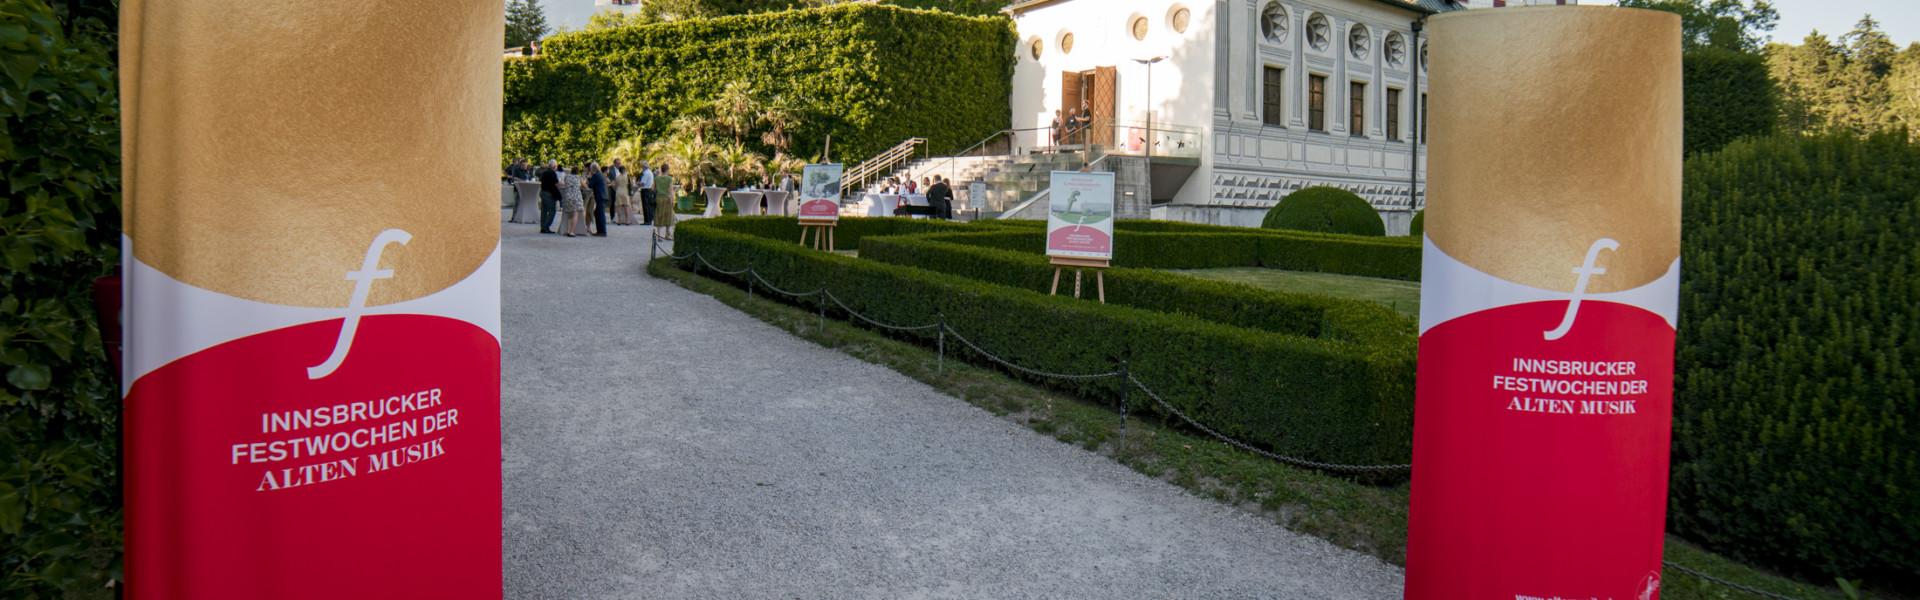 Eindrucksvolles Ambiente: Schloss Ambras in Innsbruck © Innsbrucker Festwochen, Felix Pirker